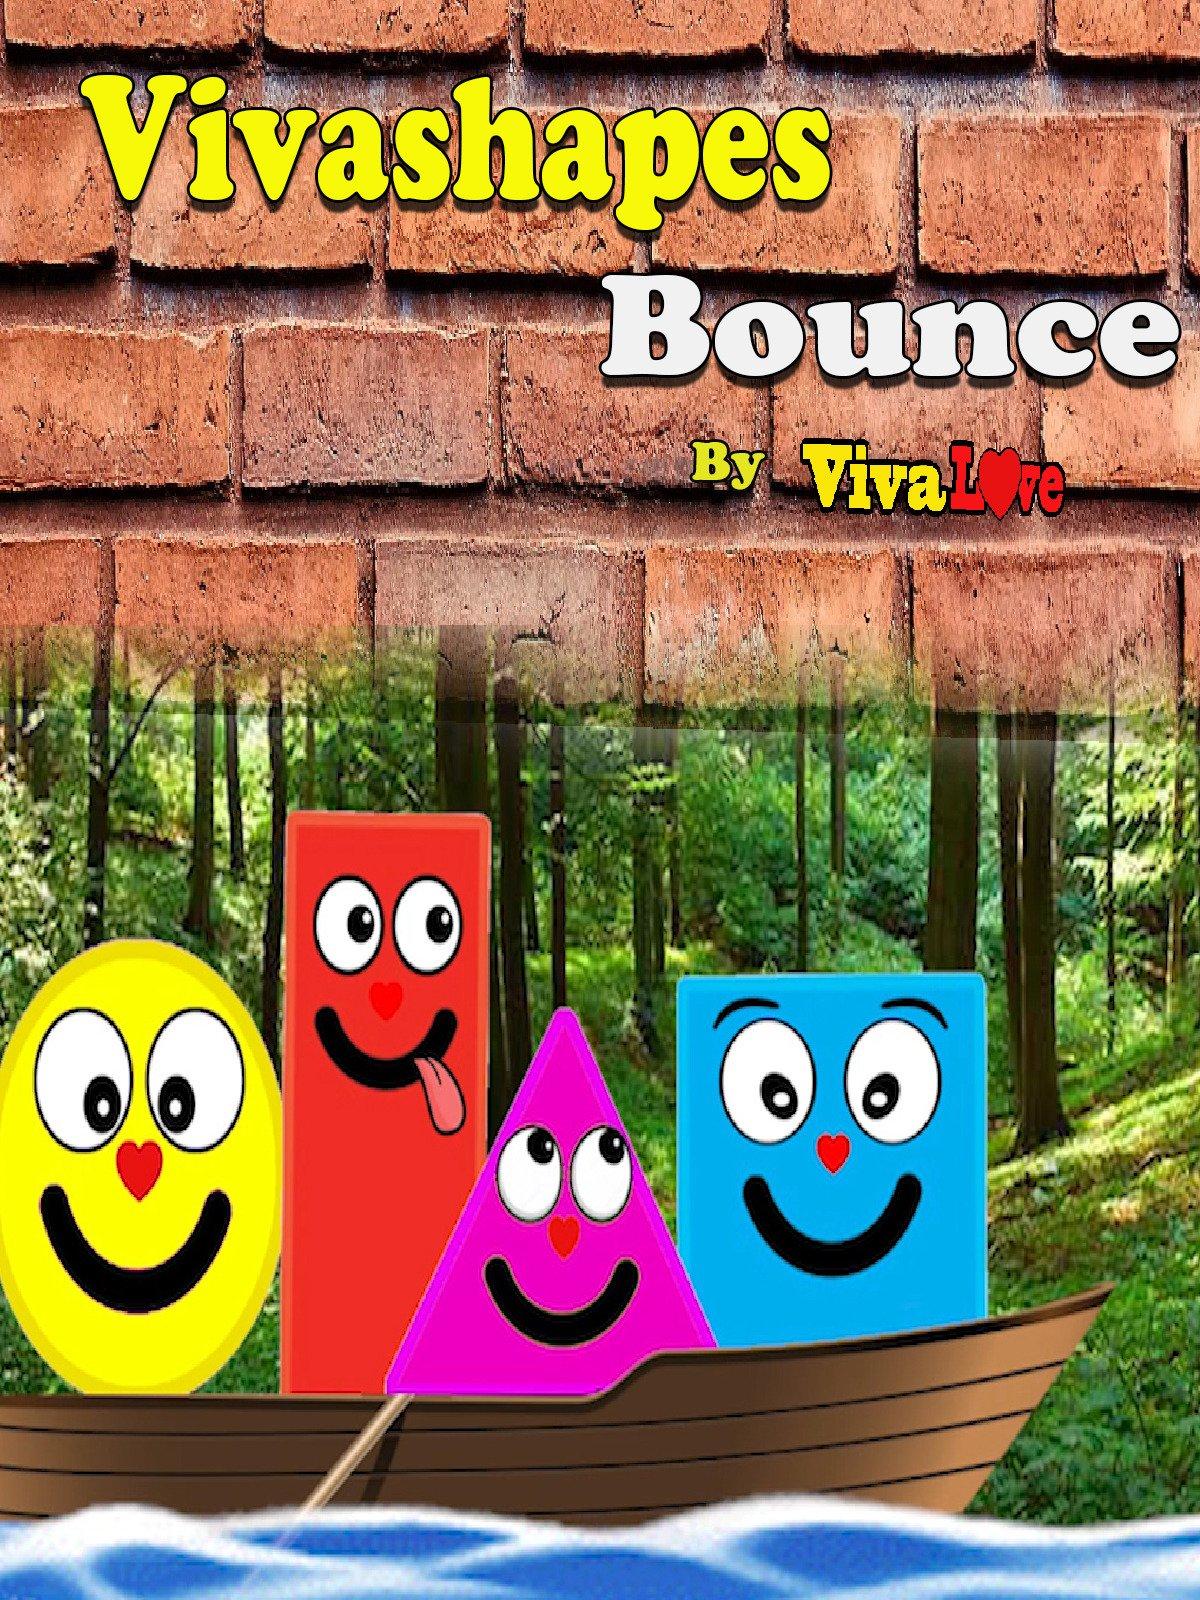 Vivashapes Bounce.